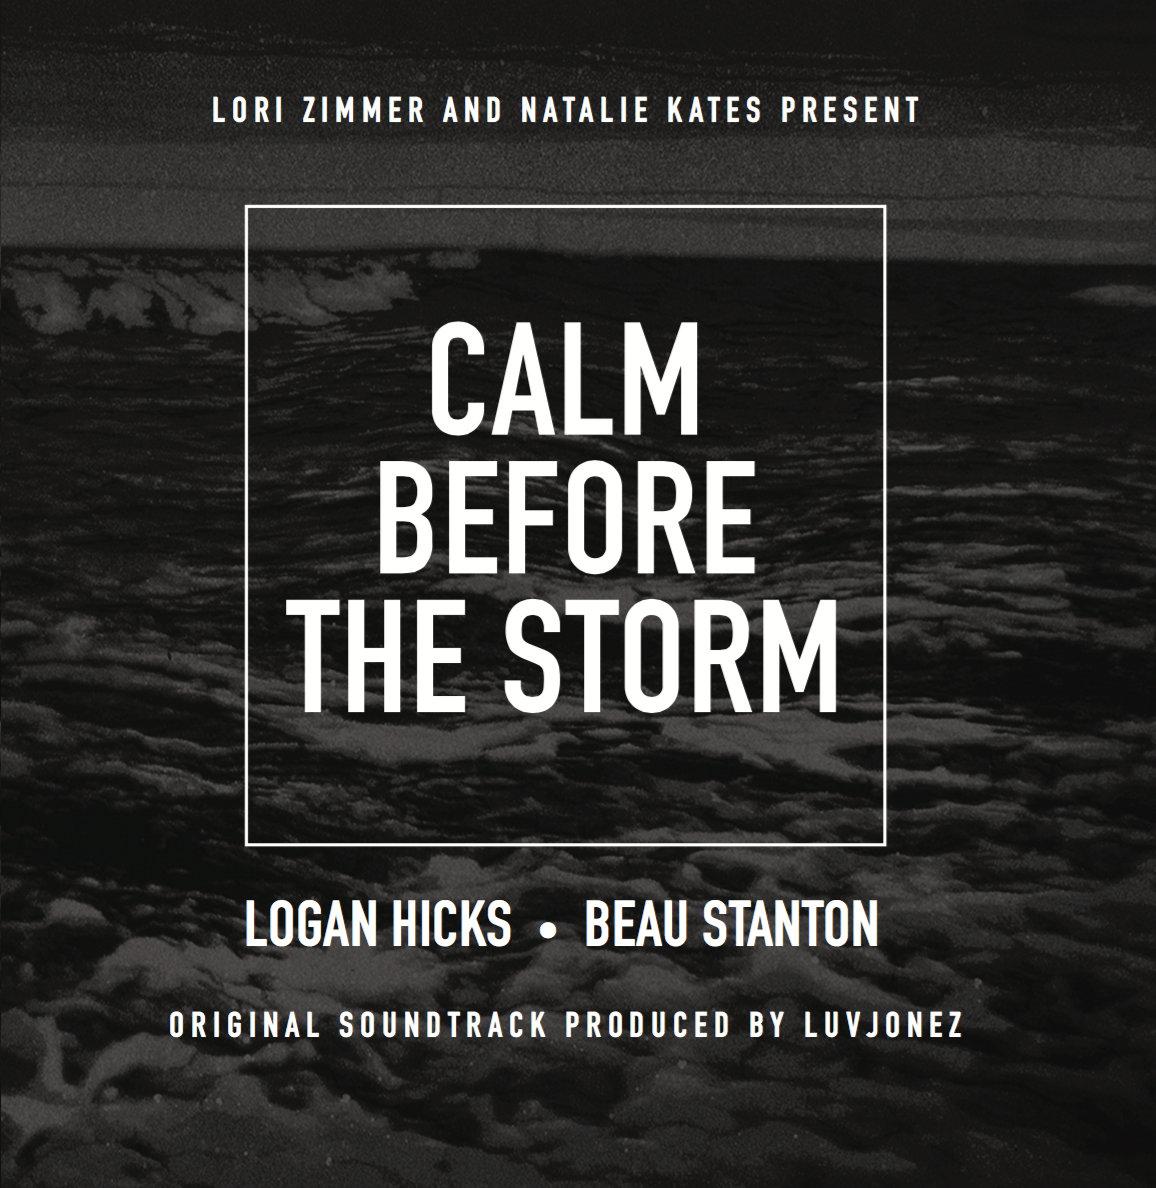 Logan Hicks X LuvJonez - Calm Before The Storm OST